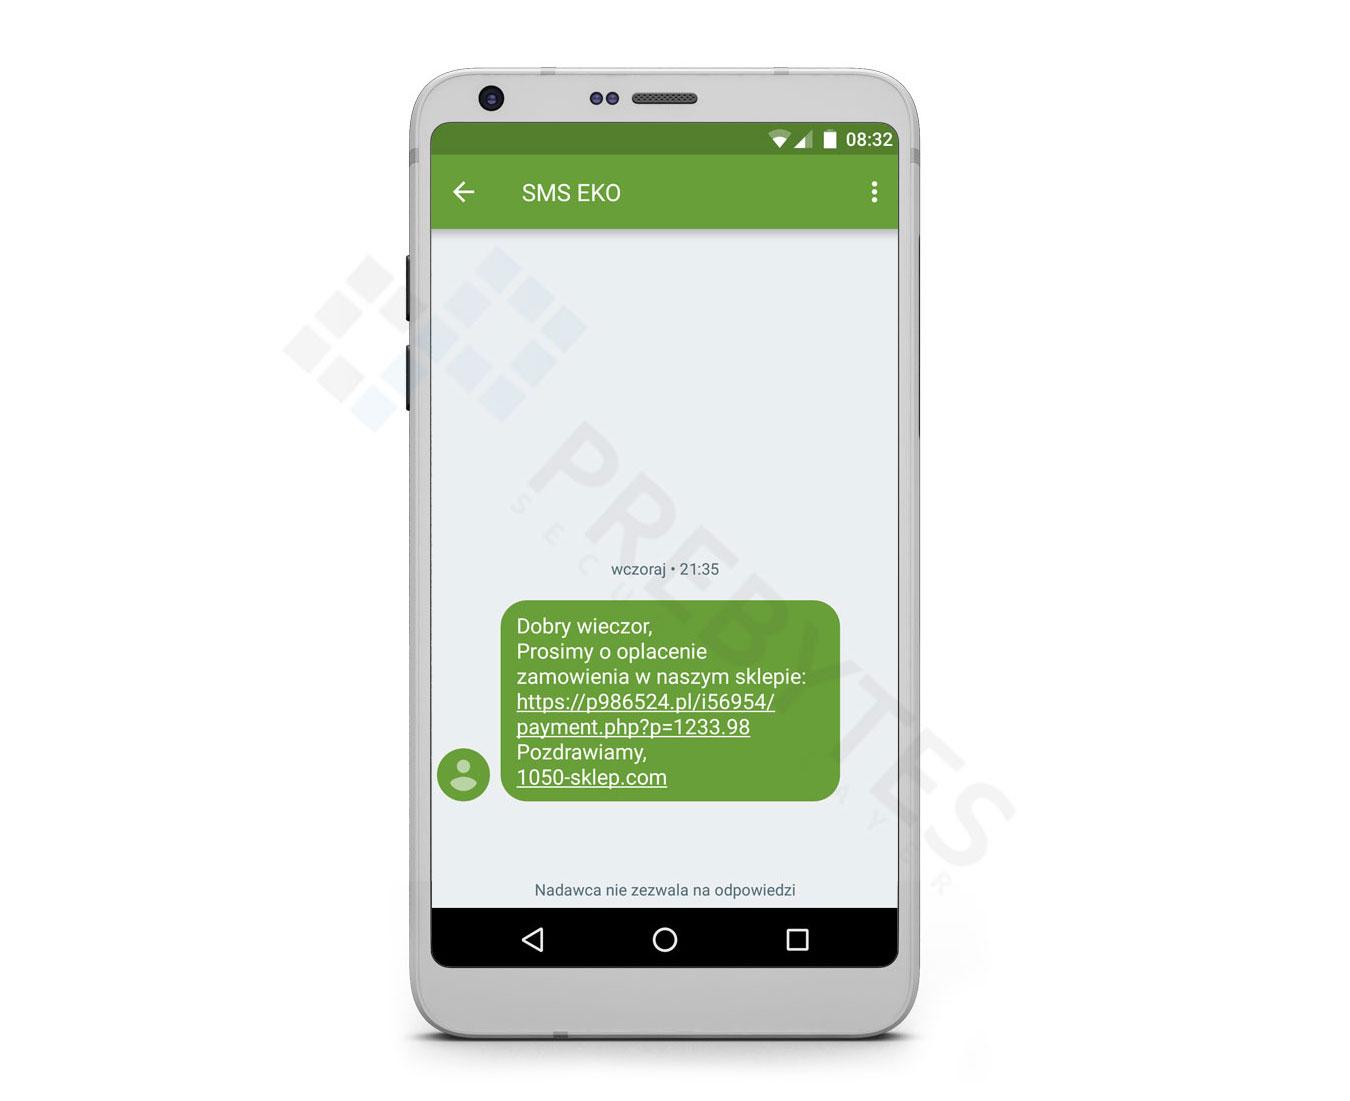 _SMS-1